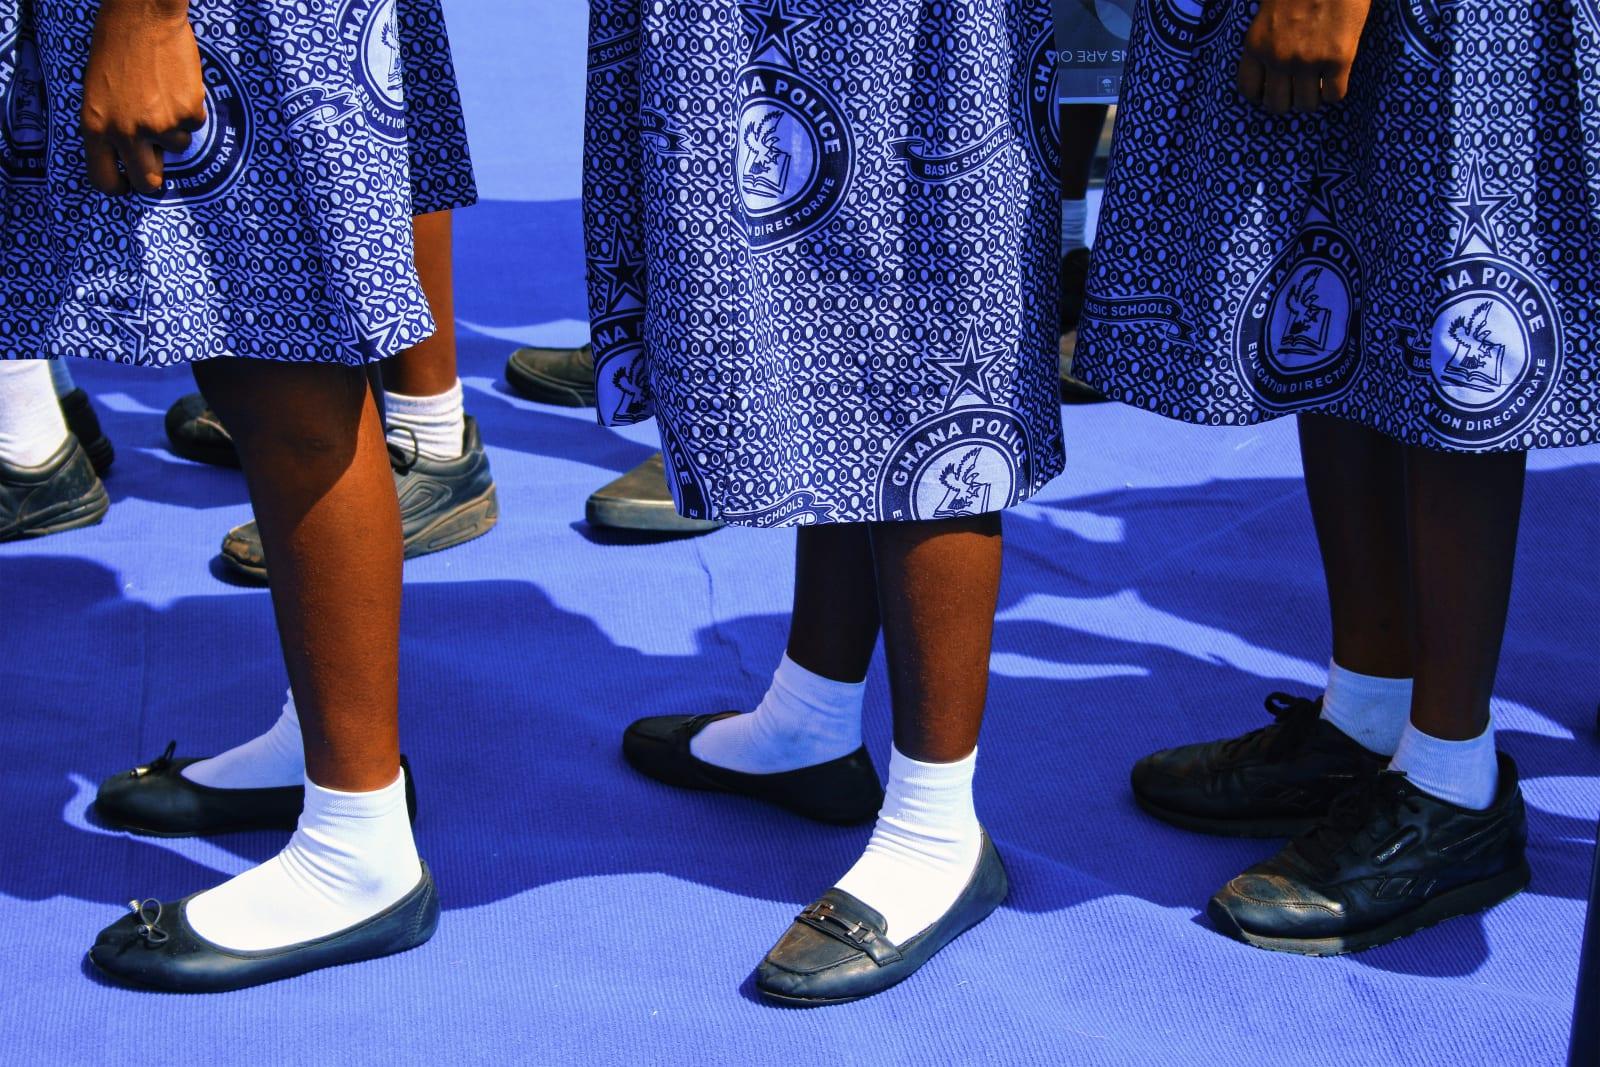 Arinzechukwu Patrick Ghana Police Children School march pass 59.4 x 39.83 cm 42 x 28.02 cm 29.7 x 19.8 cm Digital print